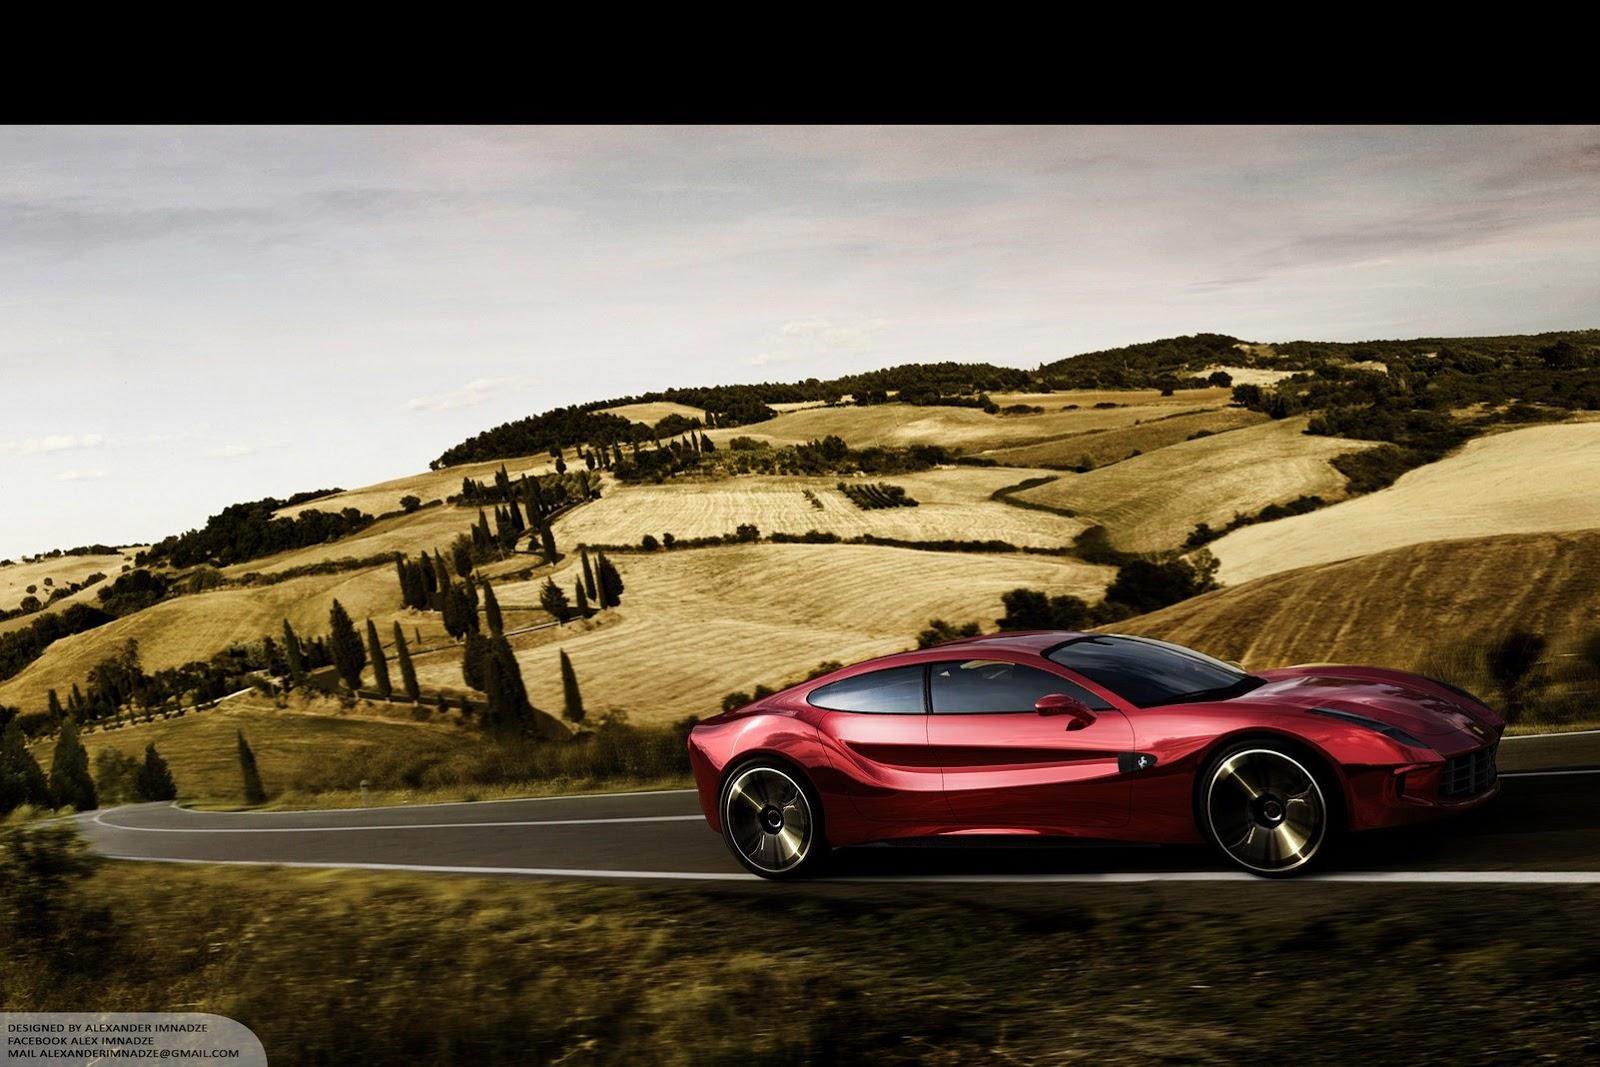 http://images.caradisiac.com/images/3/5/1/9/83519/S0-Une-proposition-de-Ferrari-Quattroporte-281553.jpg